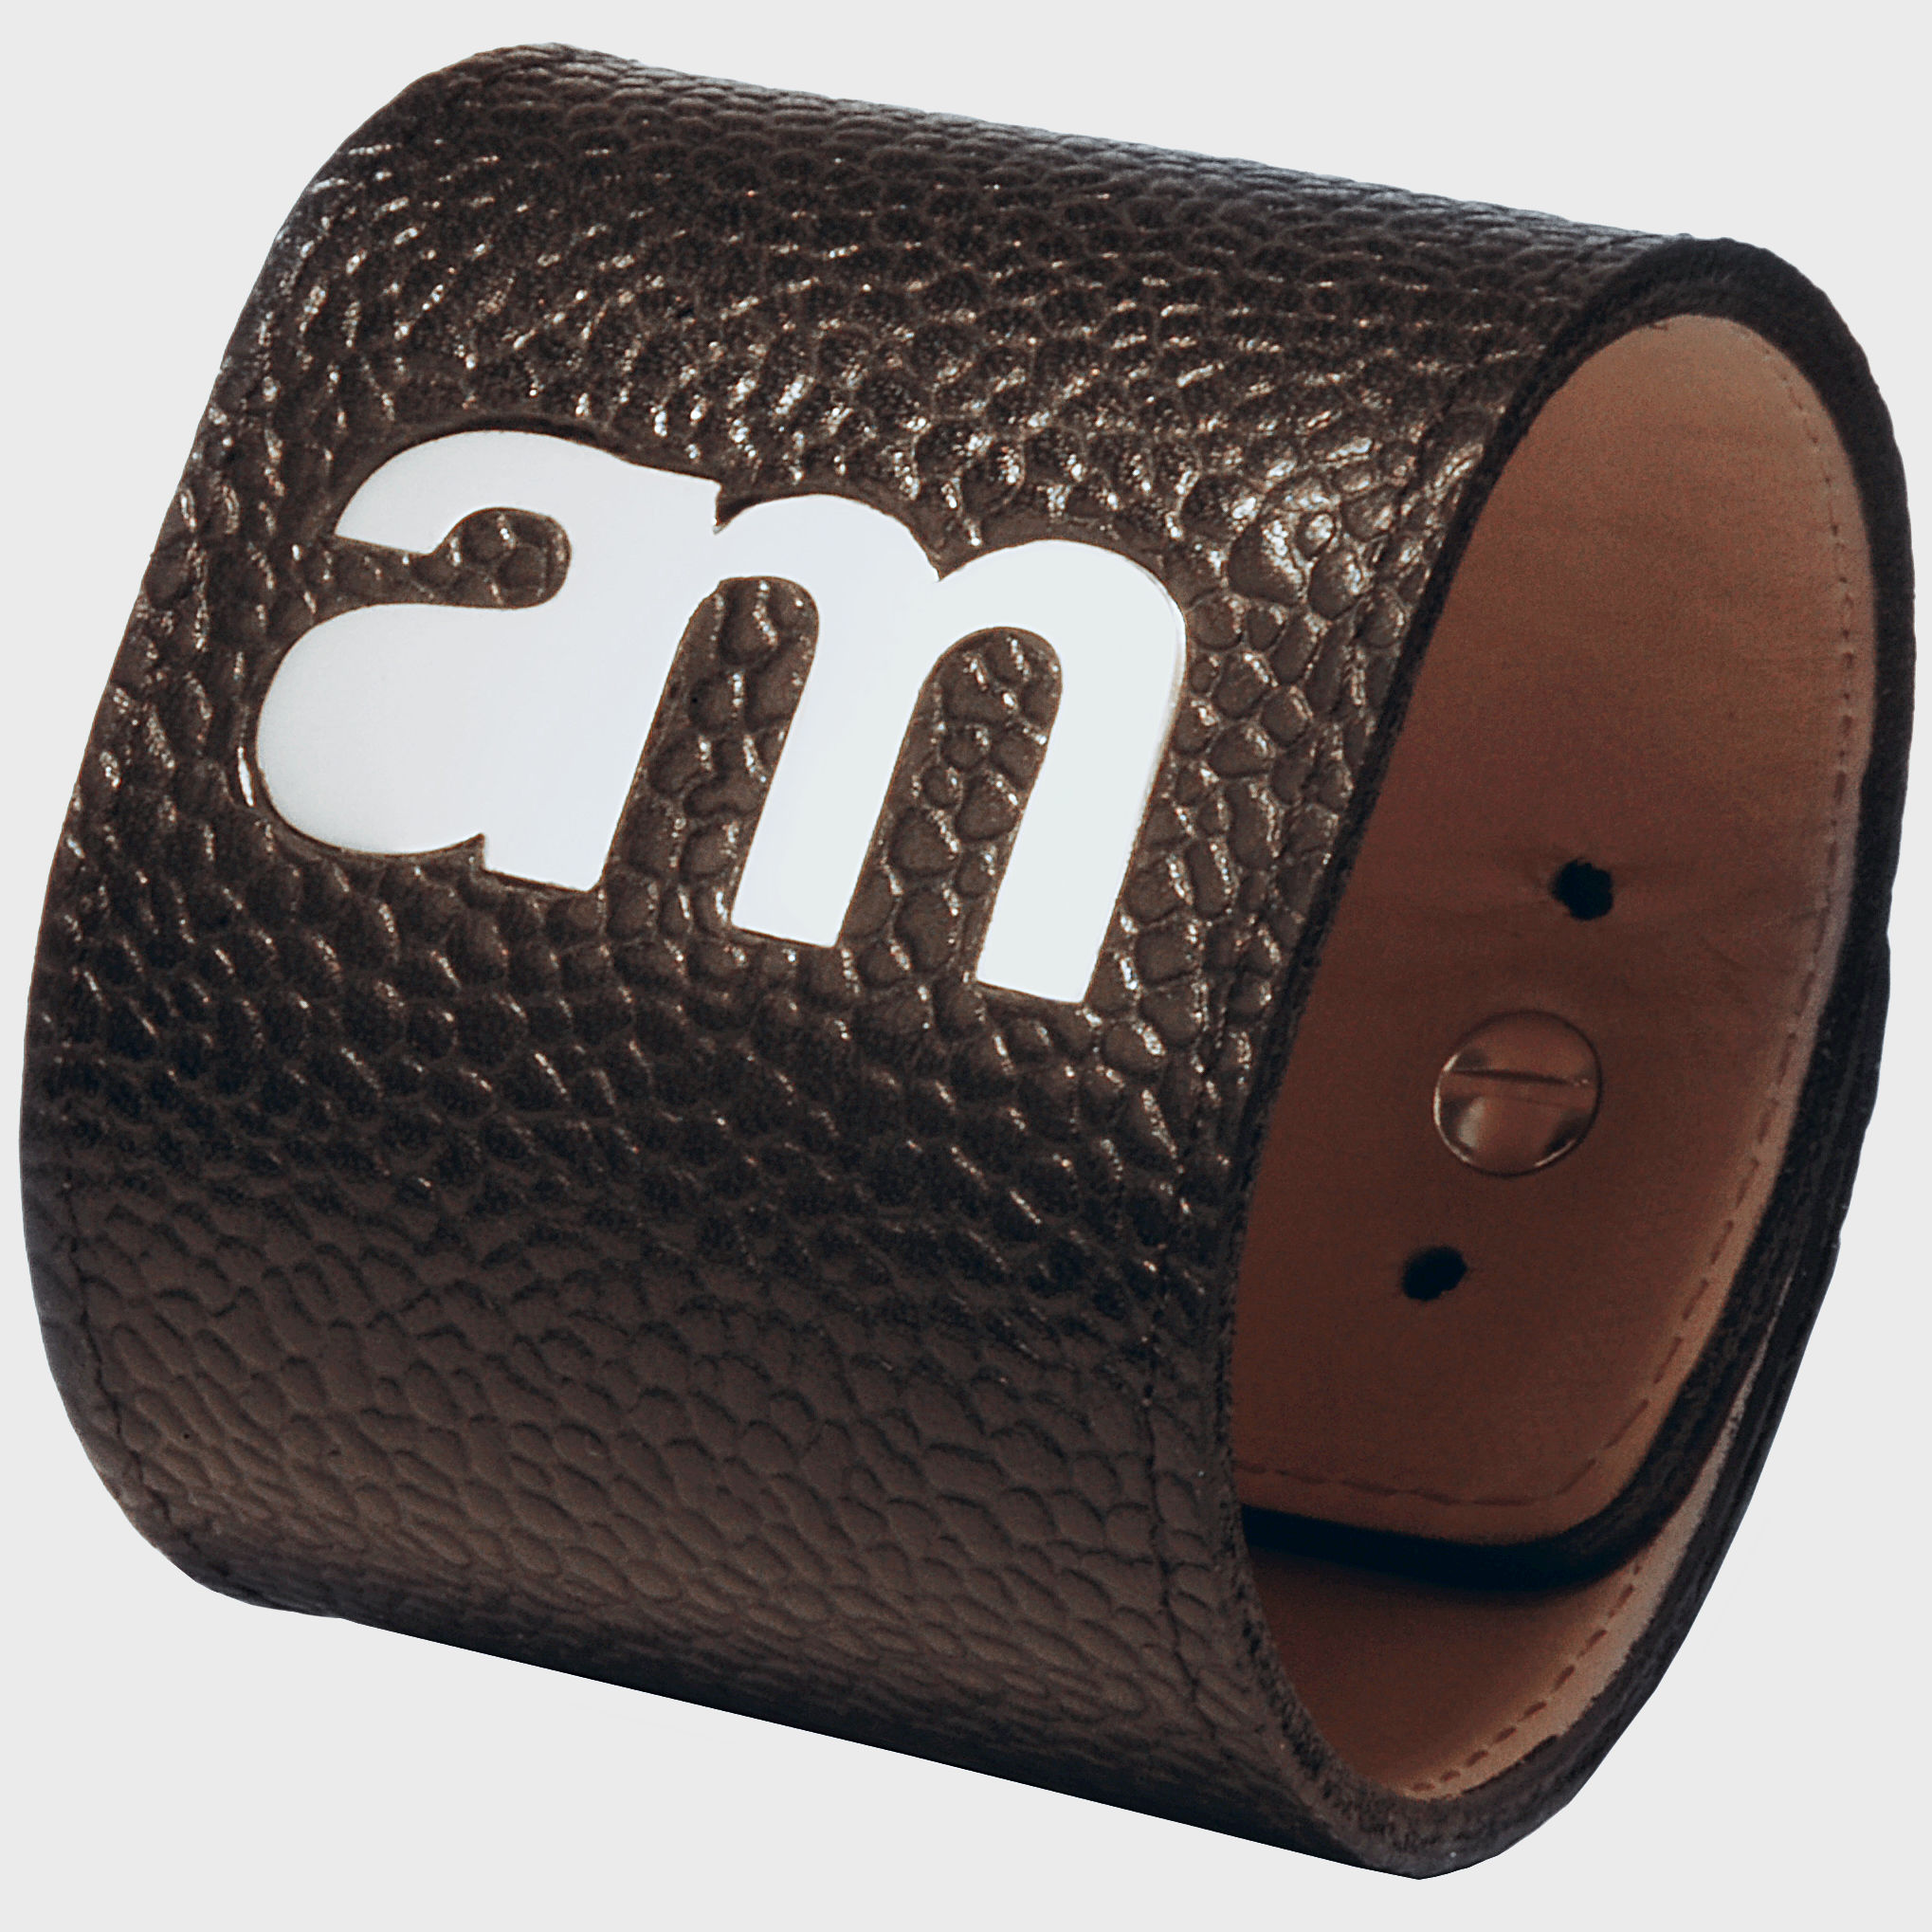 Armband Silbereinlage - Max Grün - RINGKING